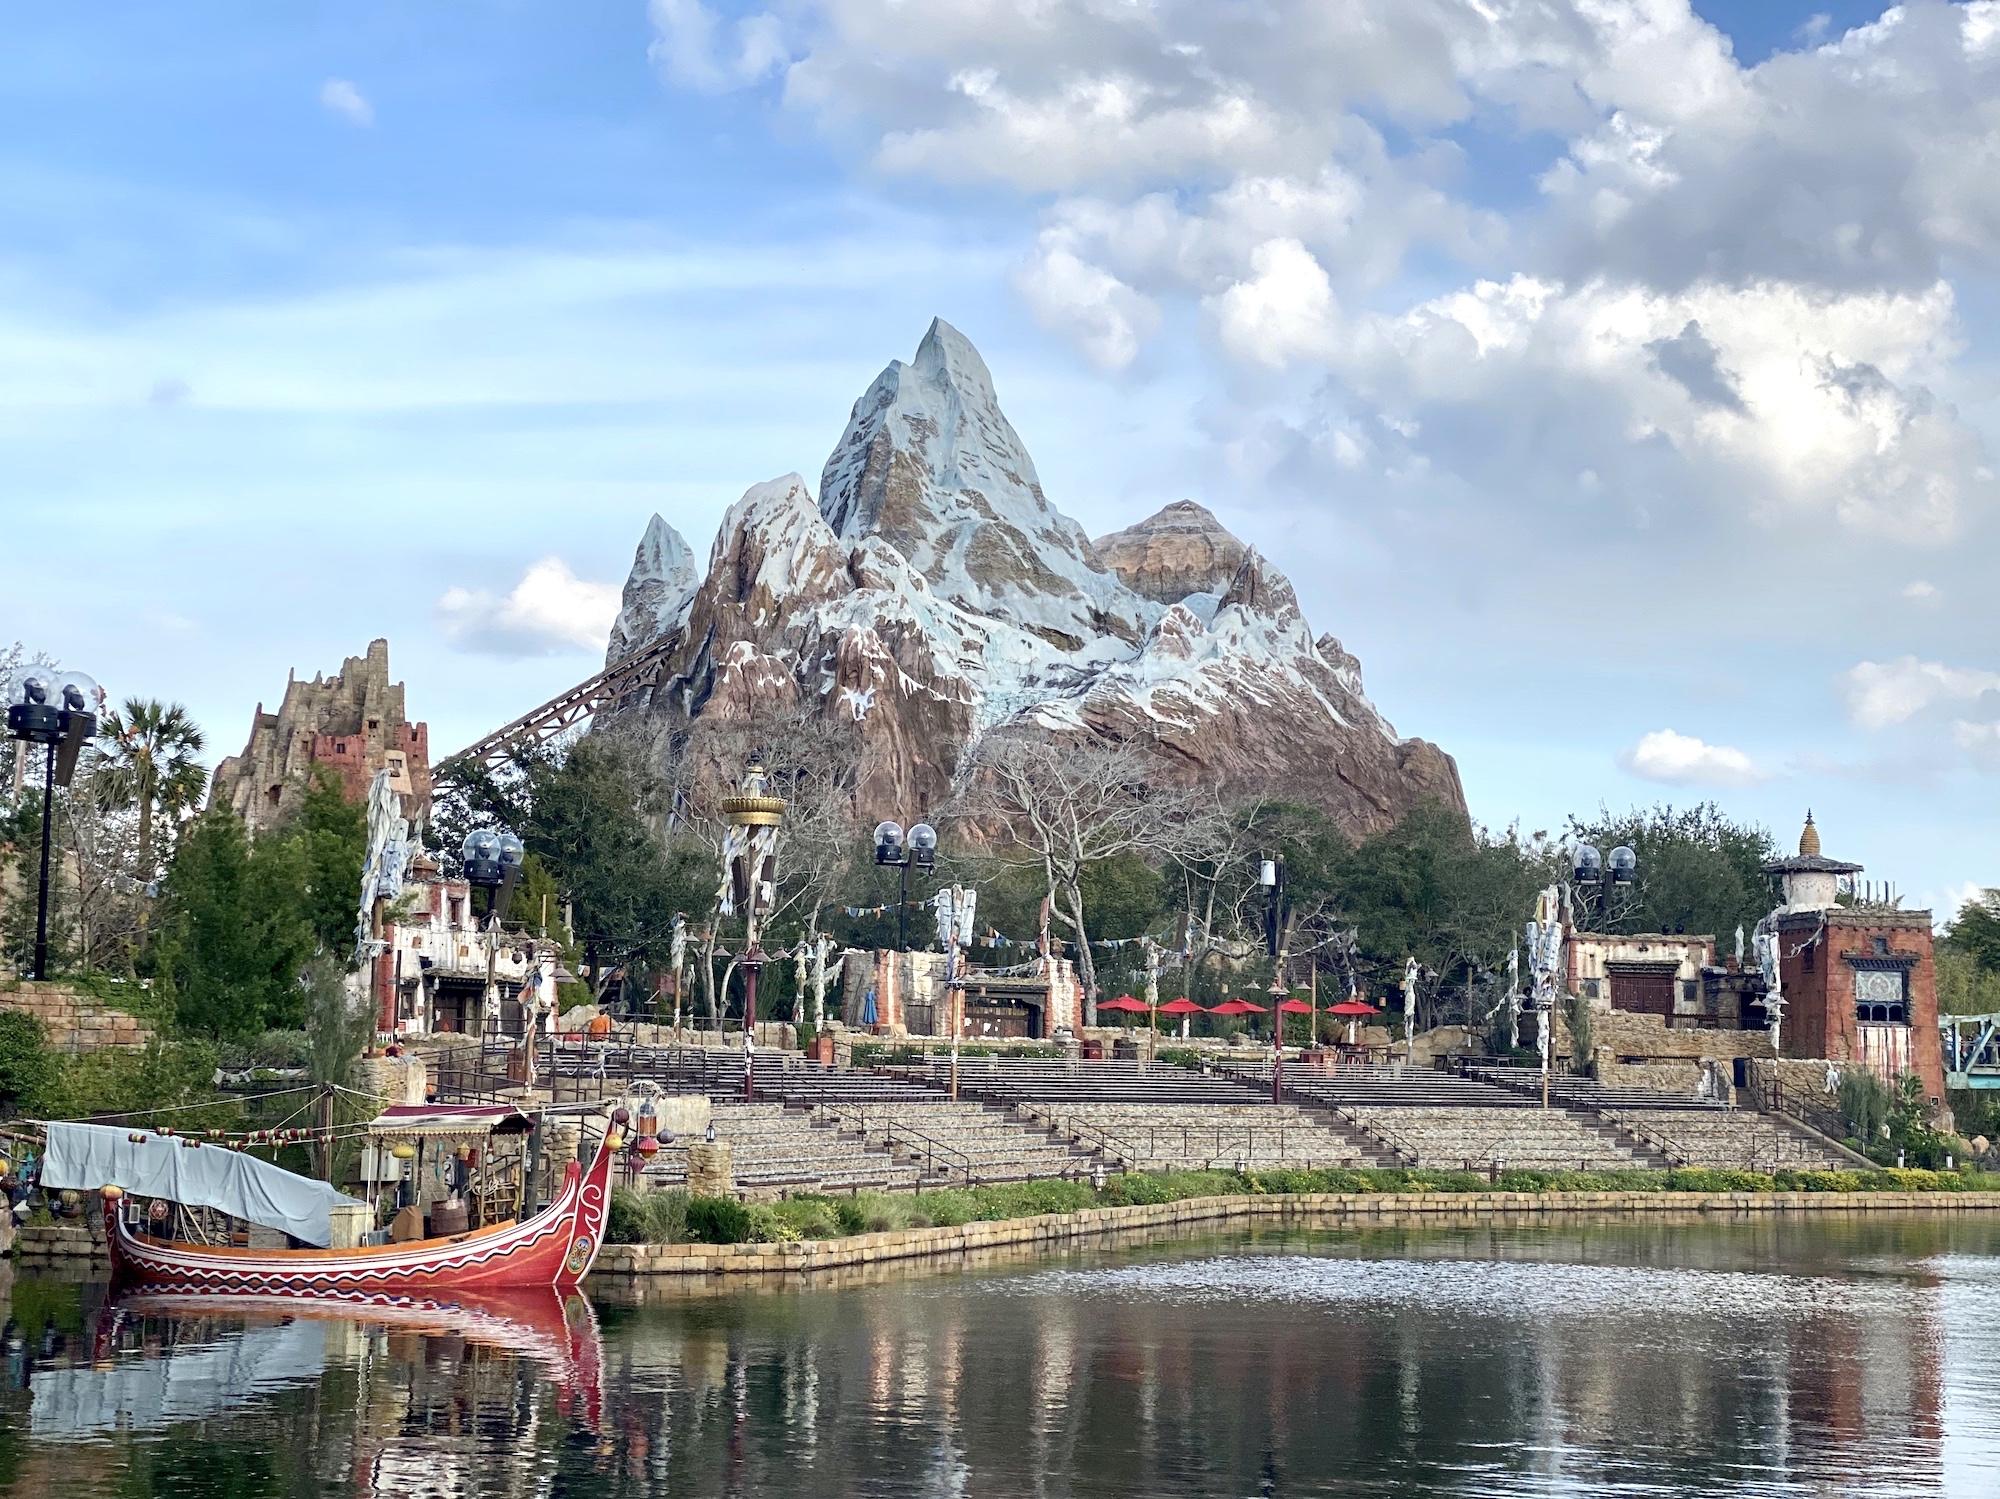 Expedition Everest Animal Disney's Animal Kingdom